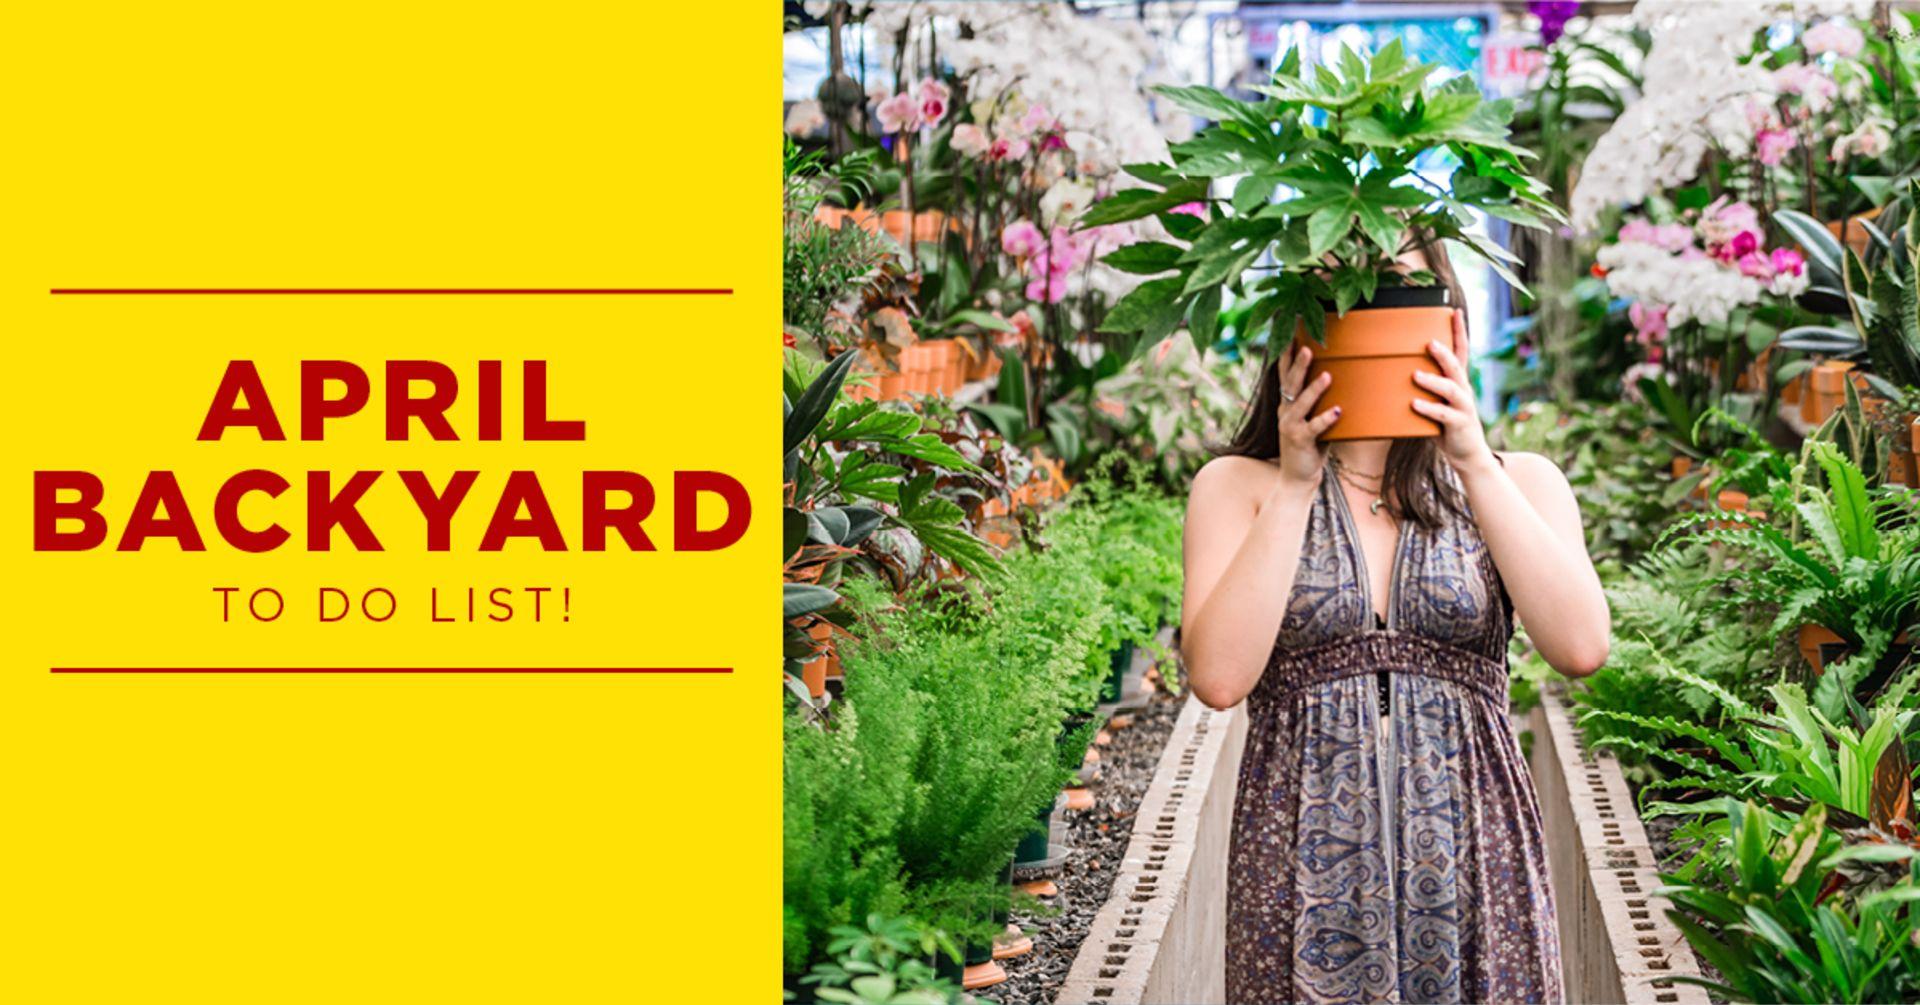 April Backyard to do List